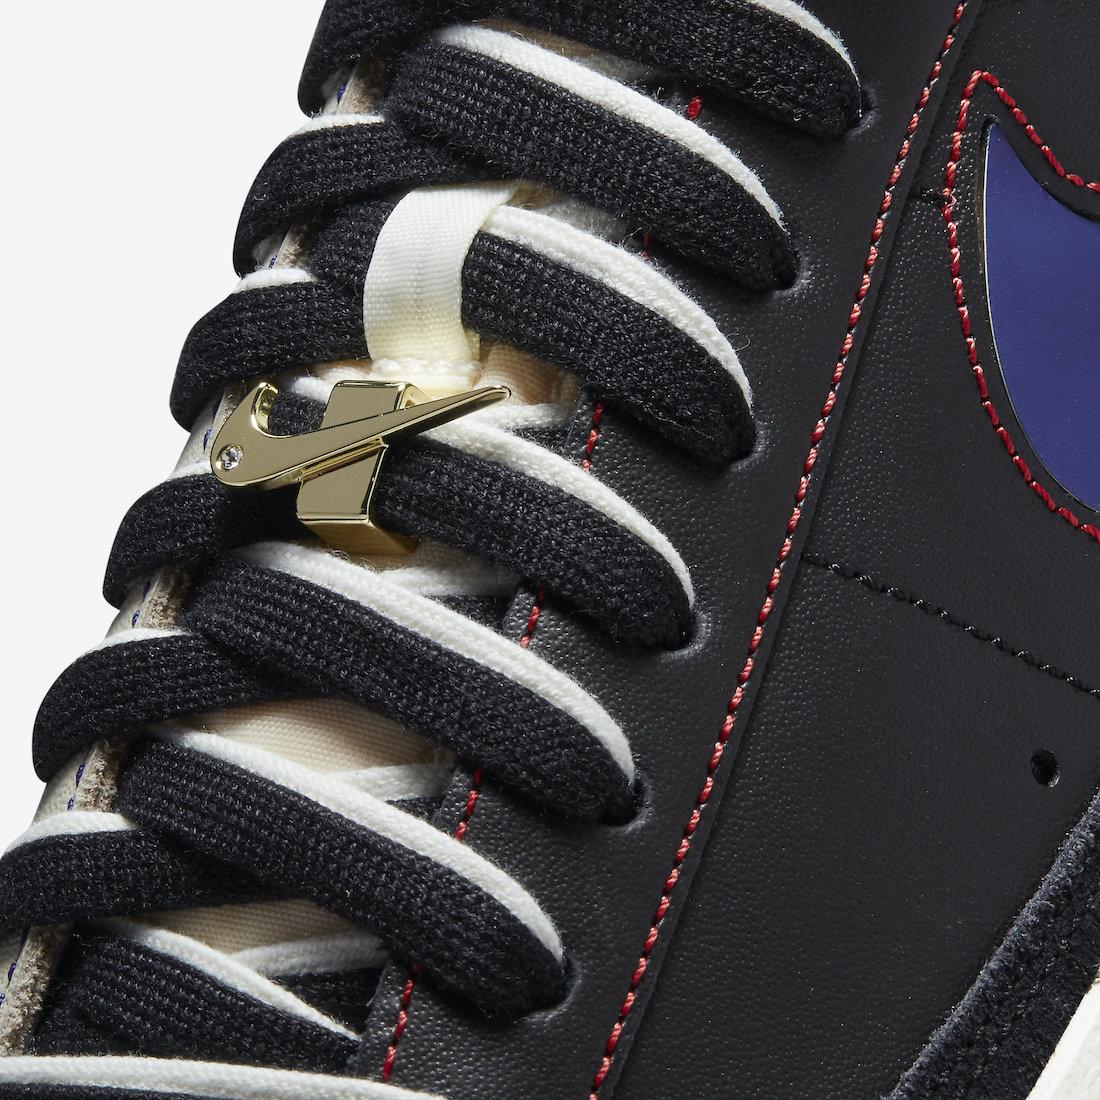 Nike Blazer Low Removable Swoosh Logos DH4370-001 Release Date Info